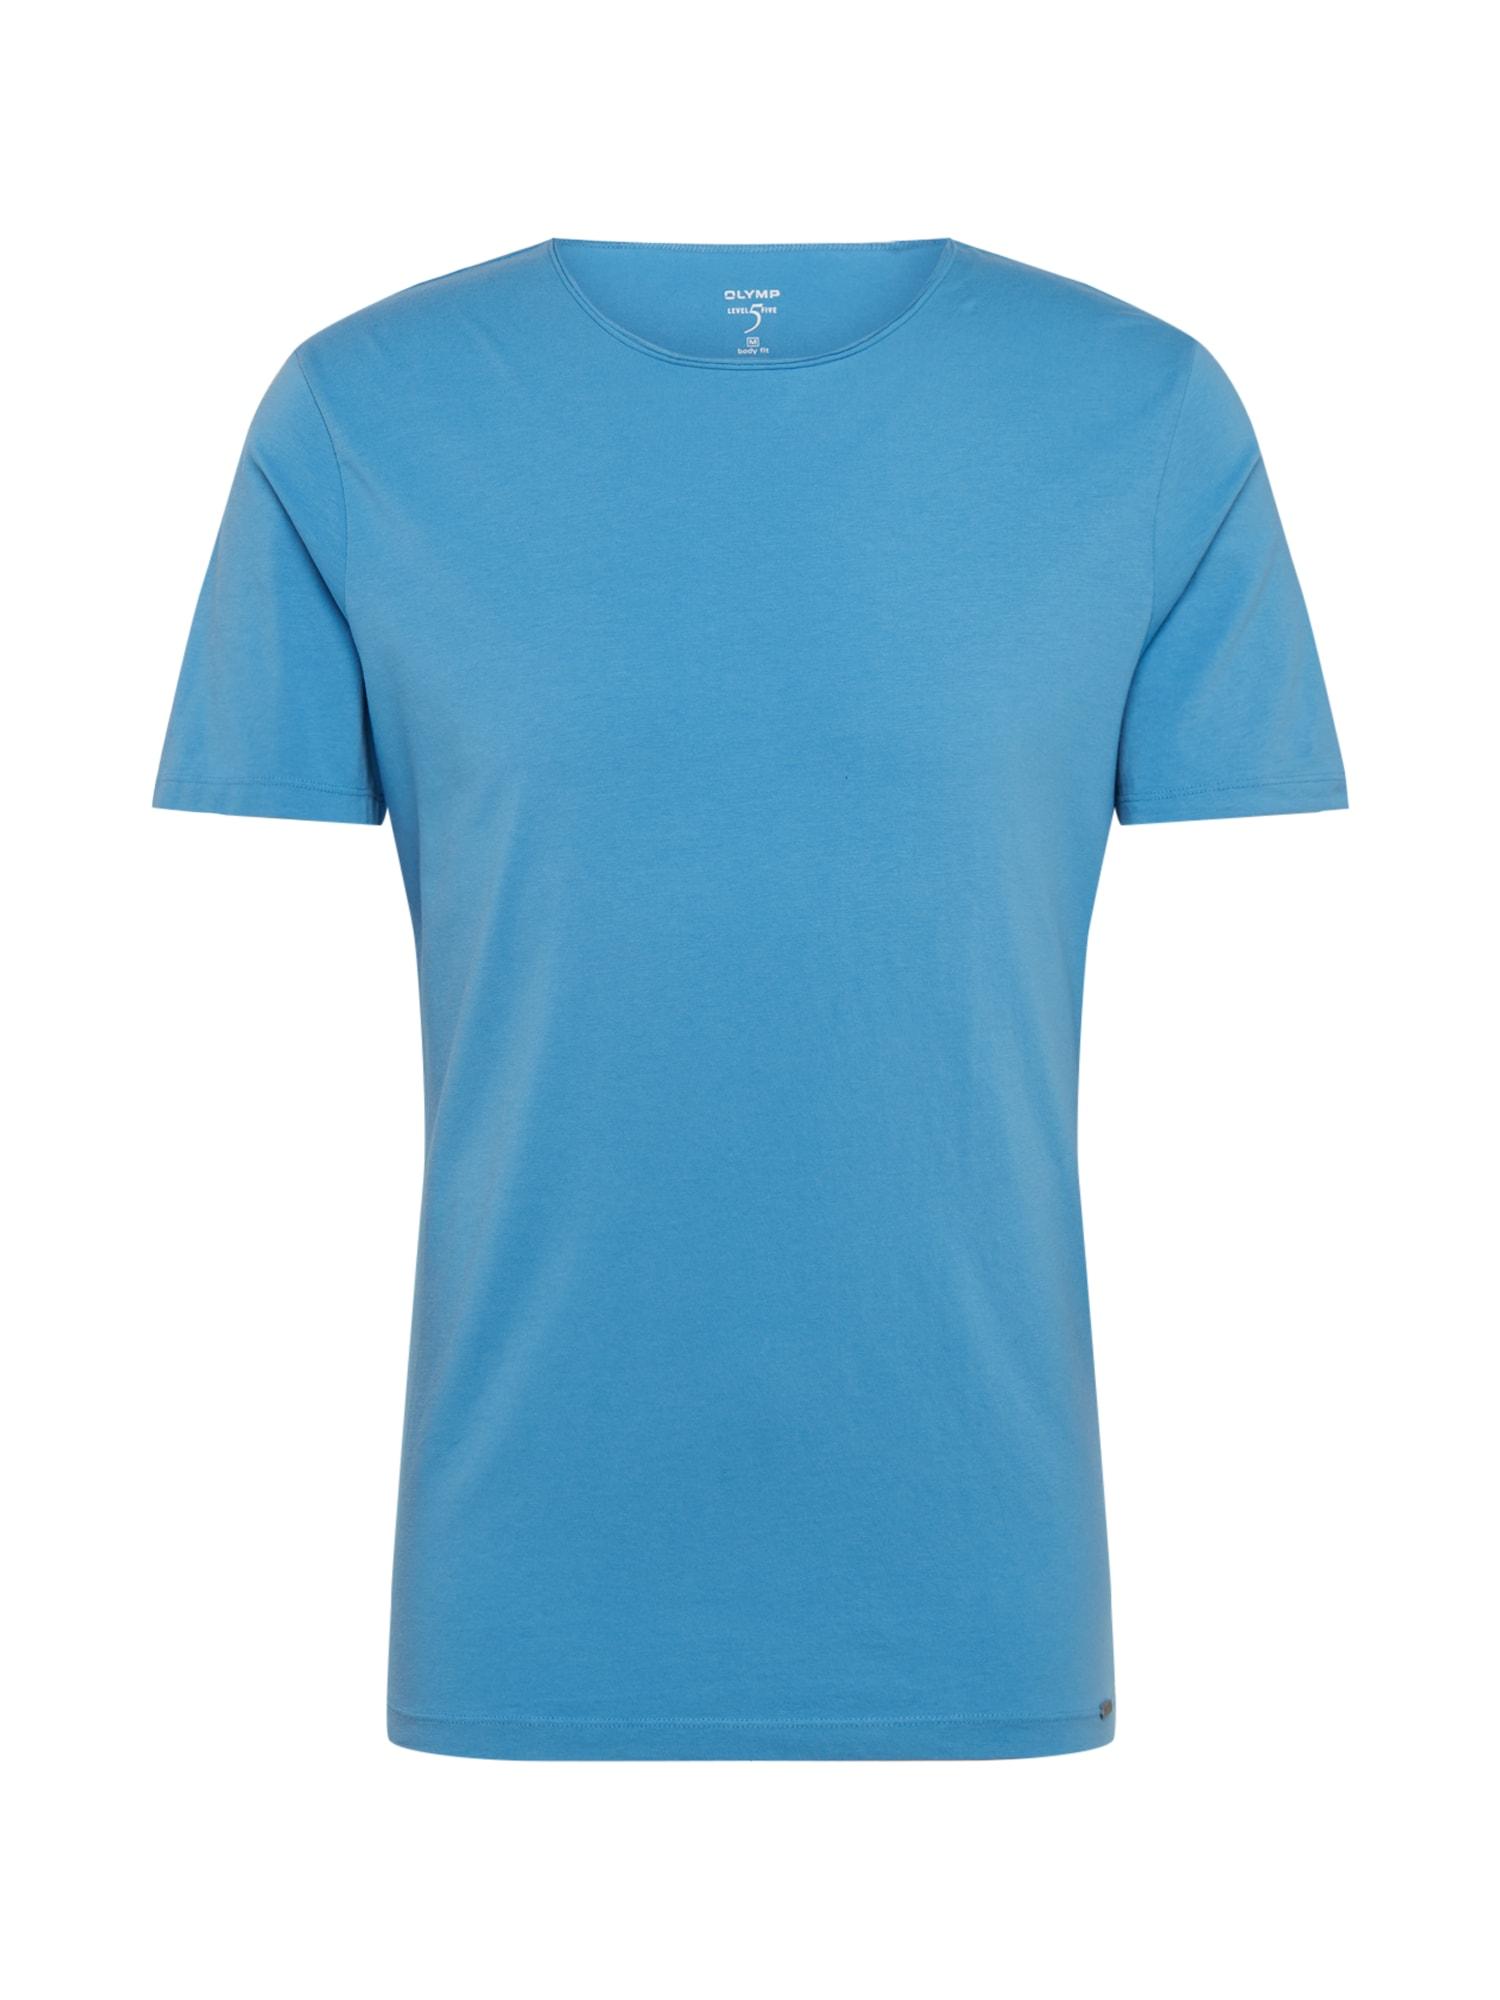 OLYMP Marškinėliai mėlyna